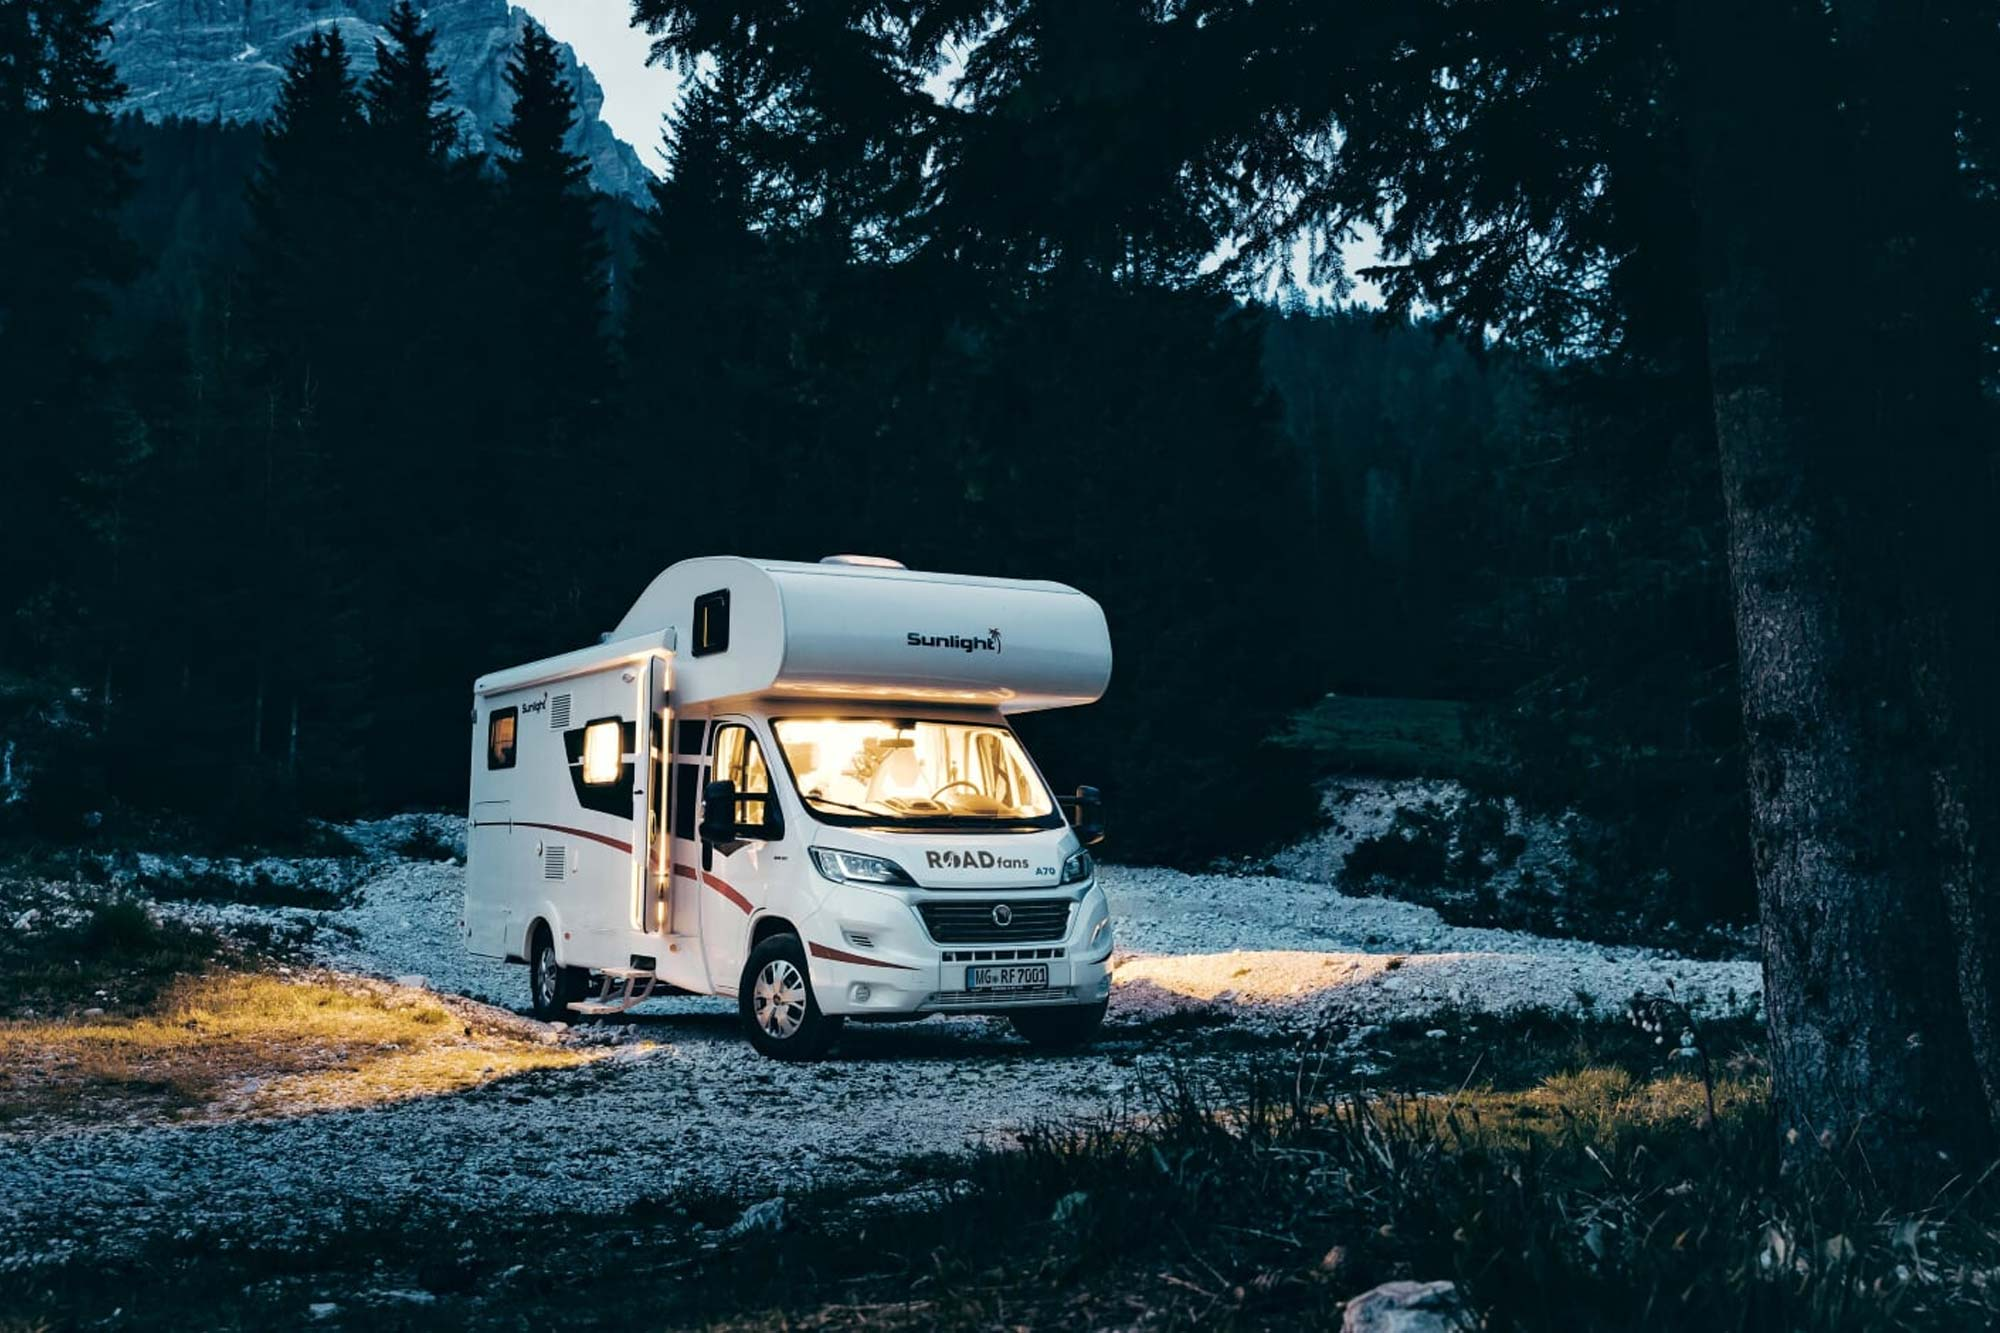 Alkoven Camper mieten bei Roadfans in Bonn